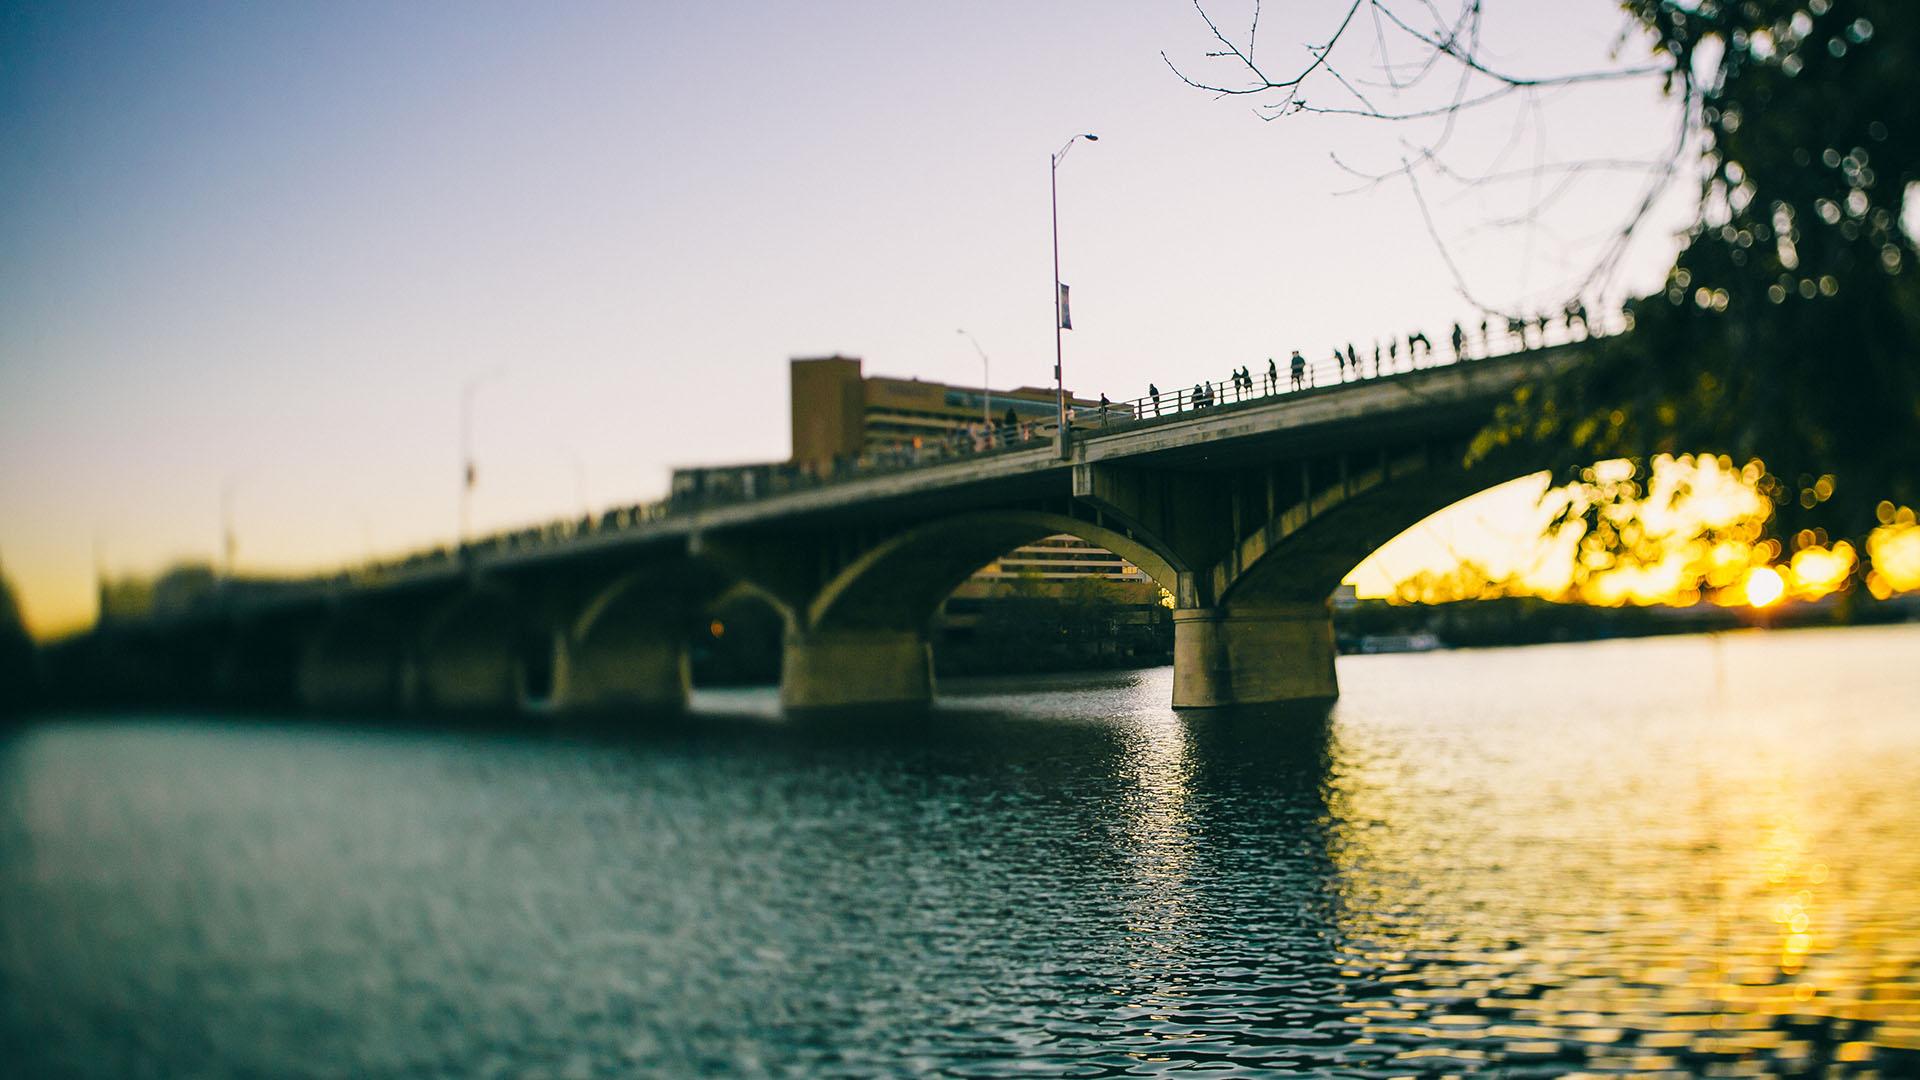 Image of Congress Bridge